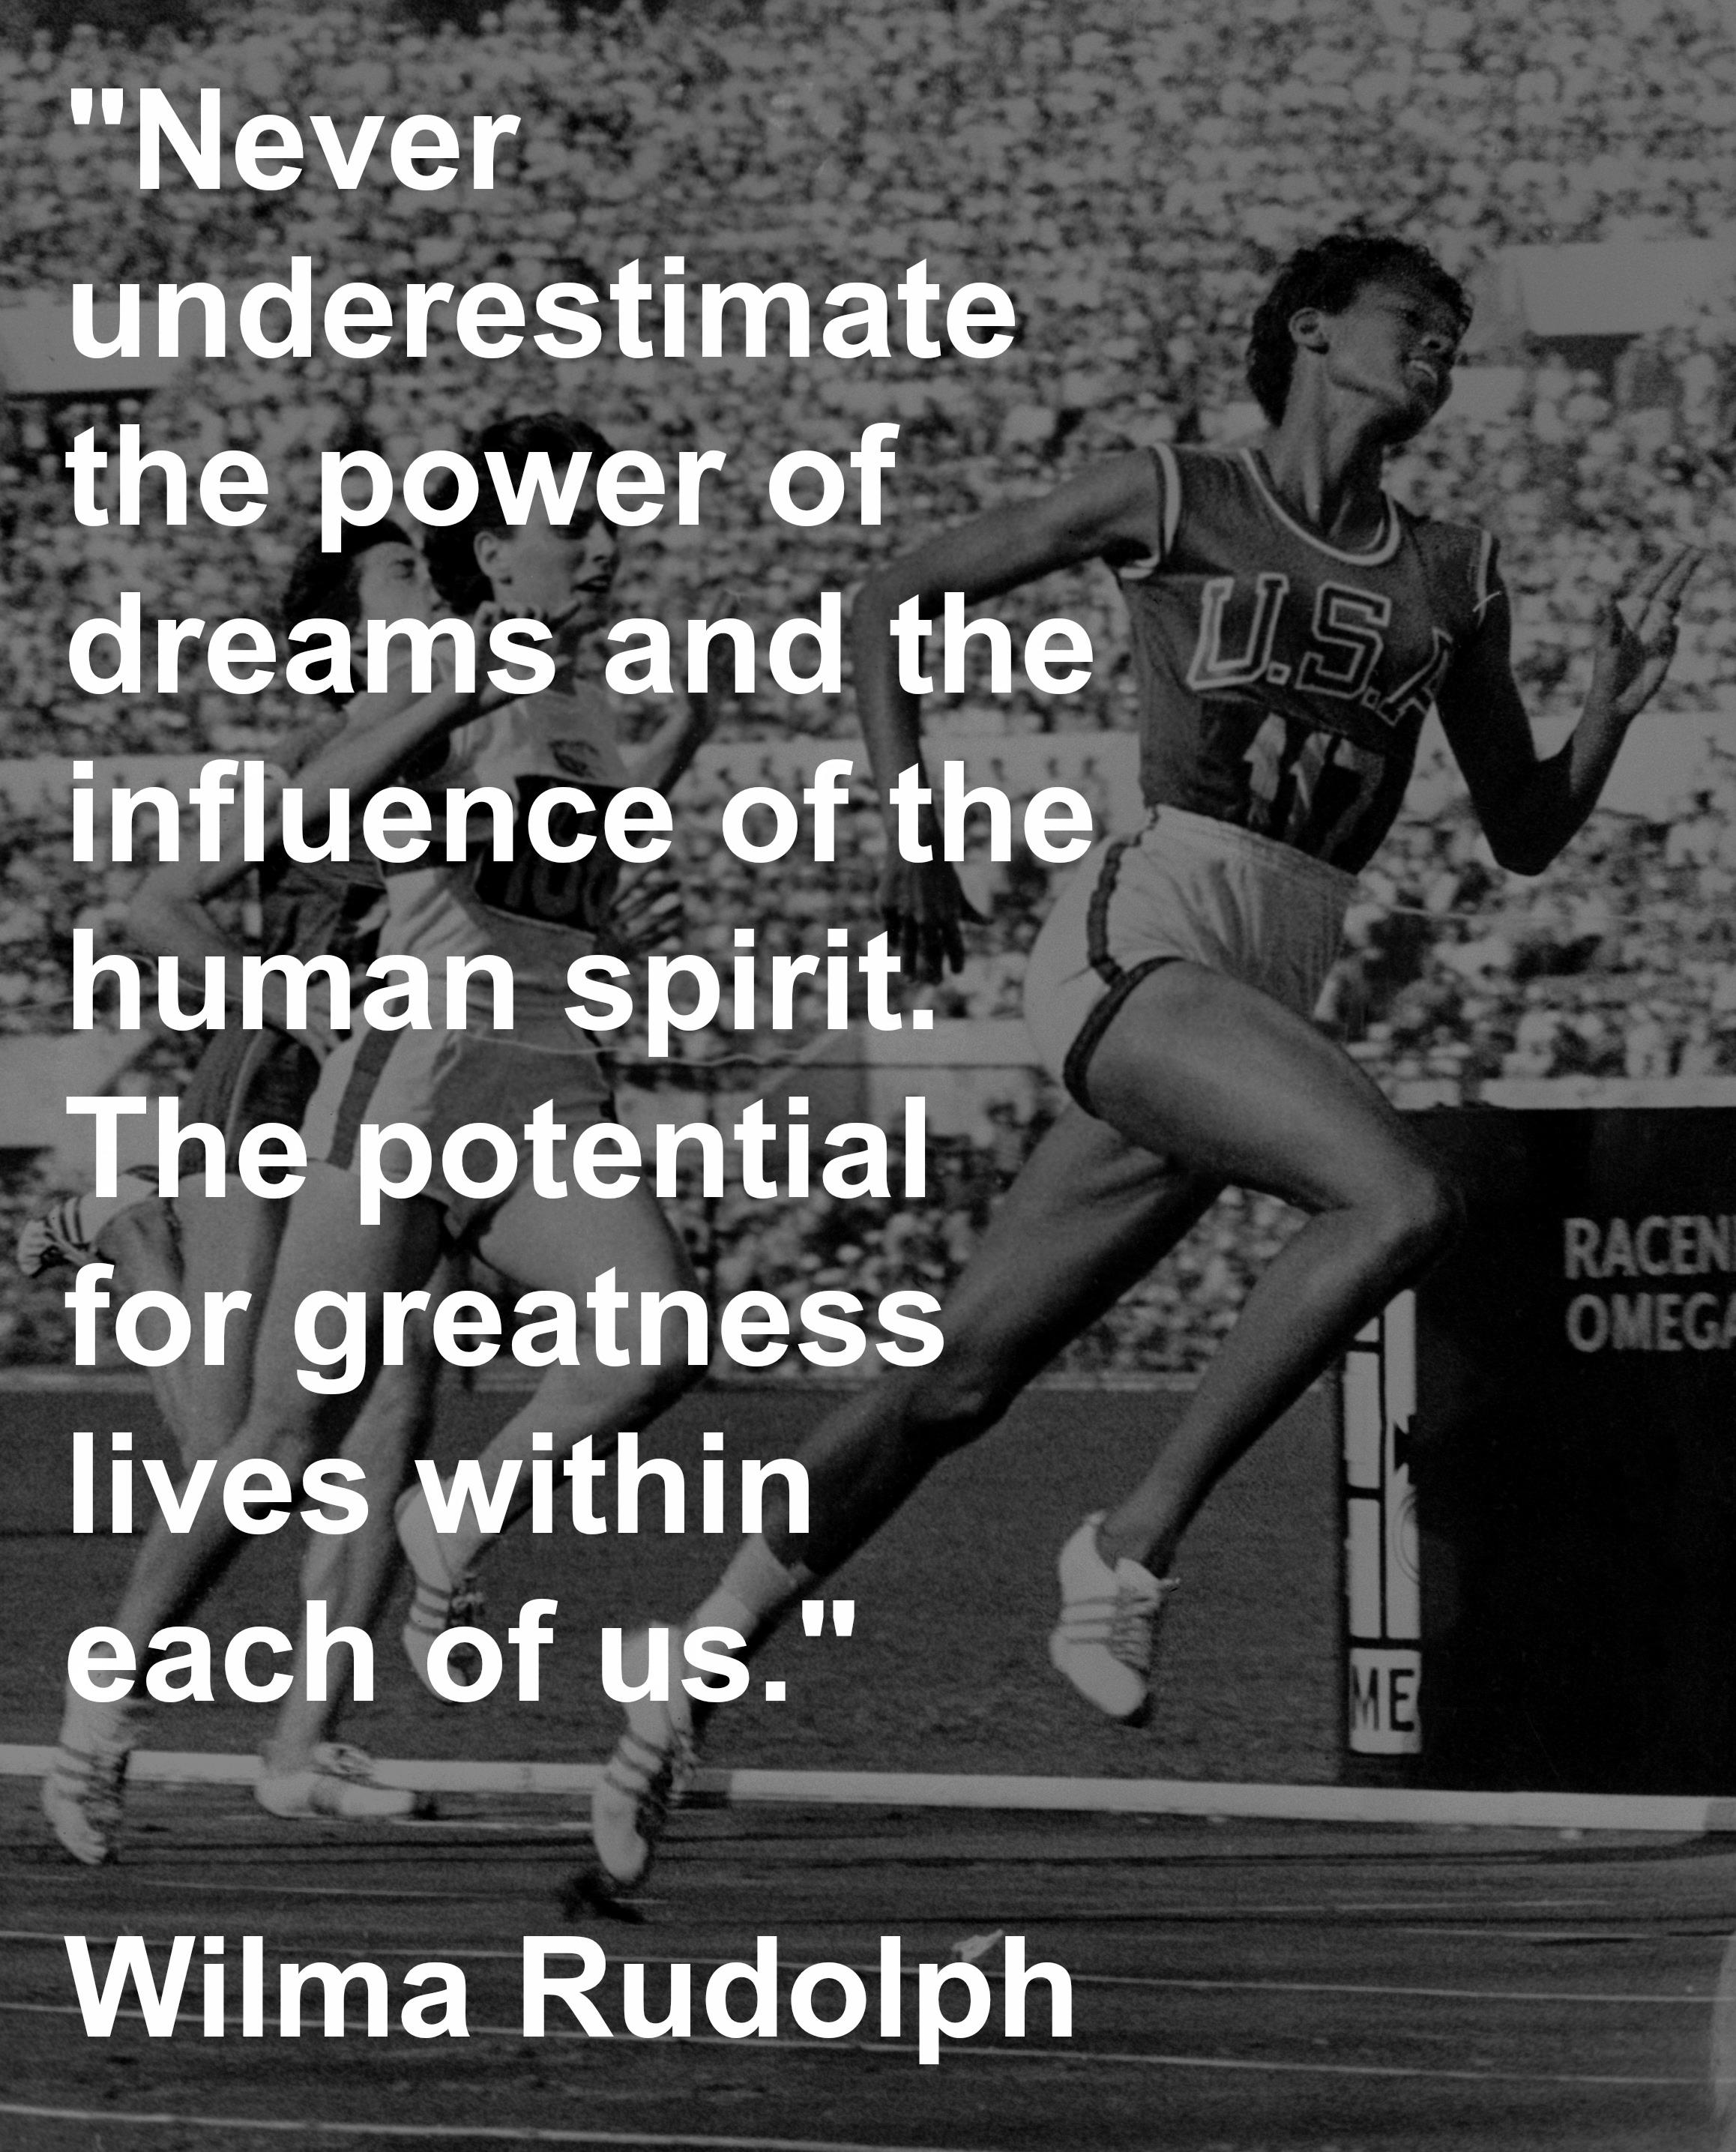 Famous Sports Women Quotes. QuotesGram